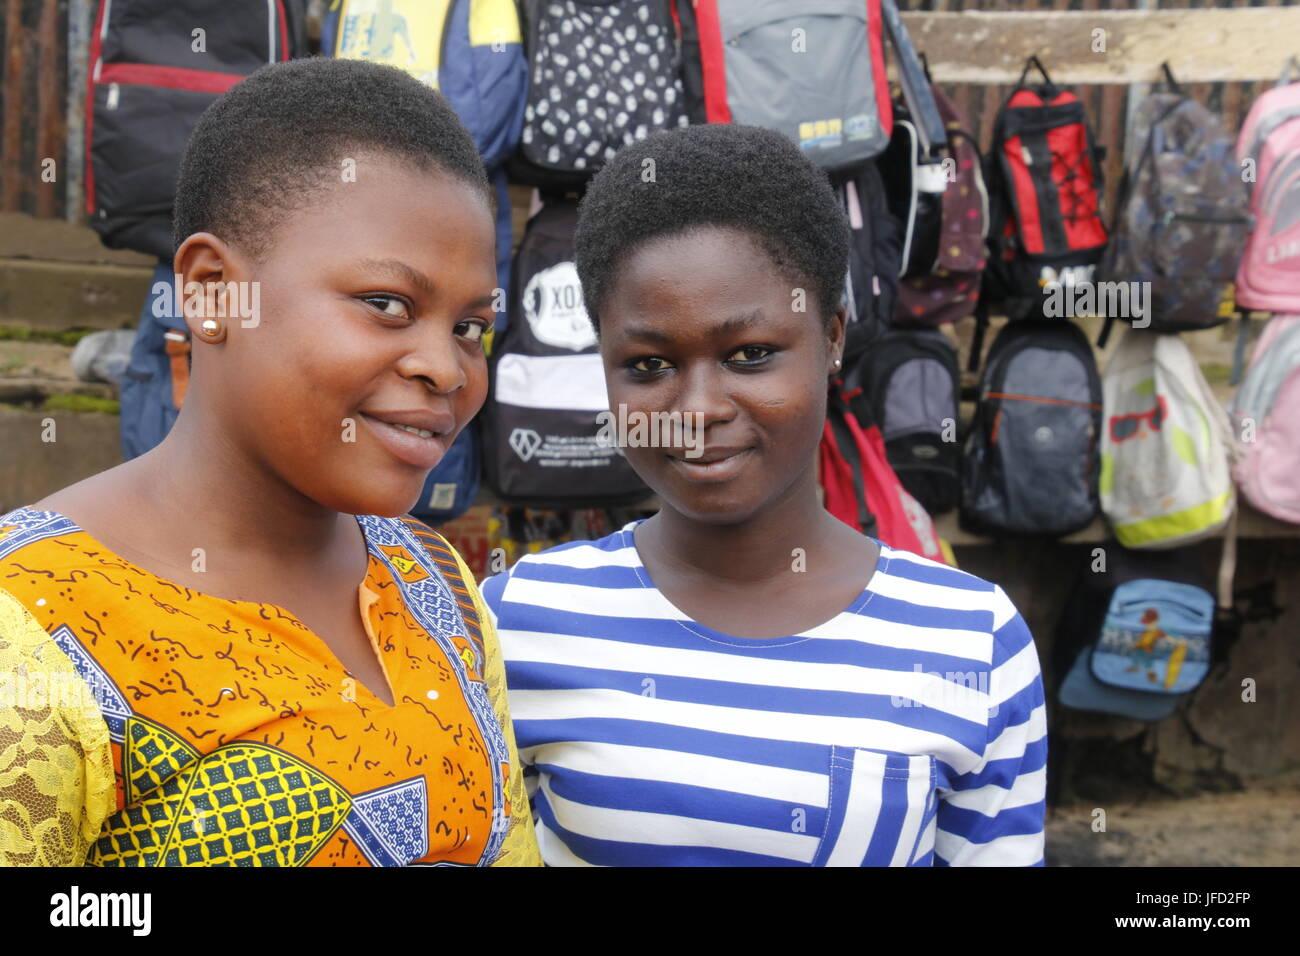 Ghanaian teenagers - Stock Image